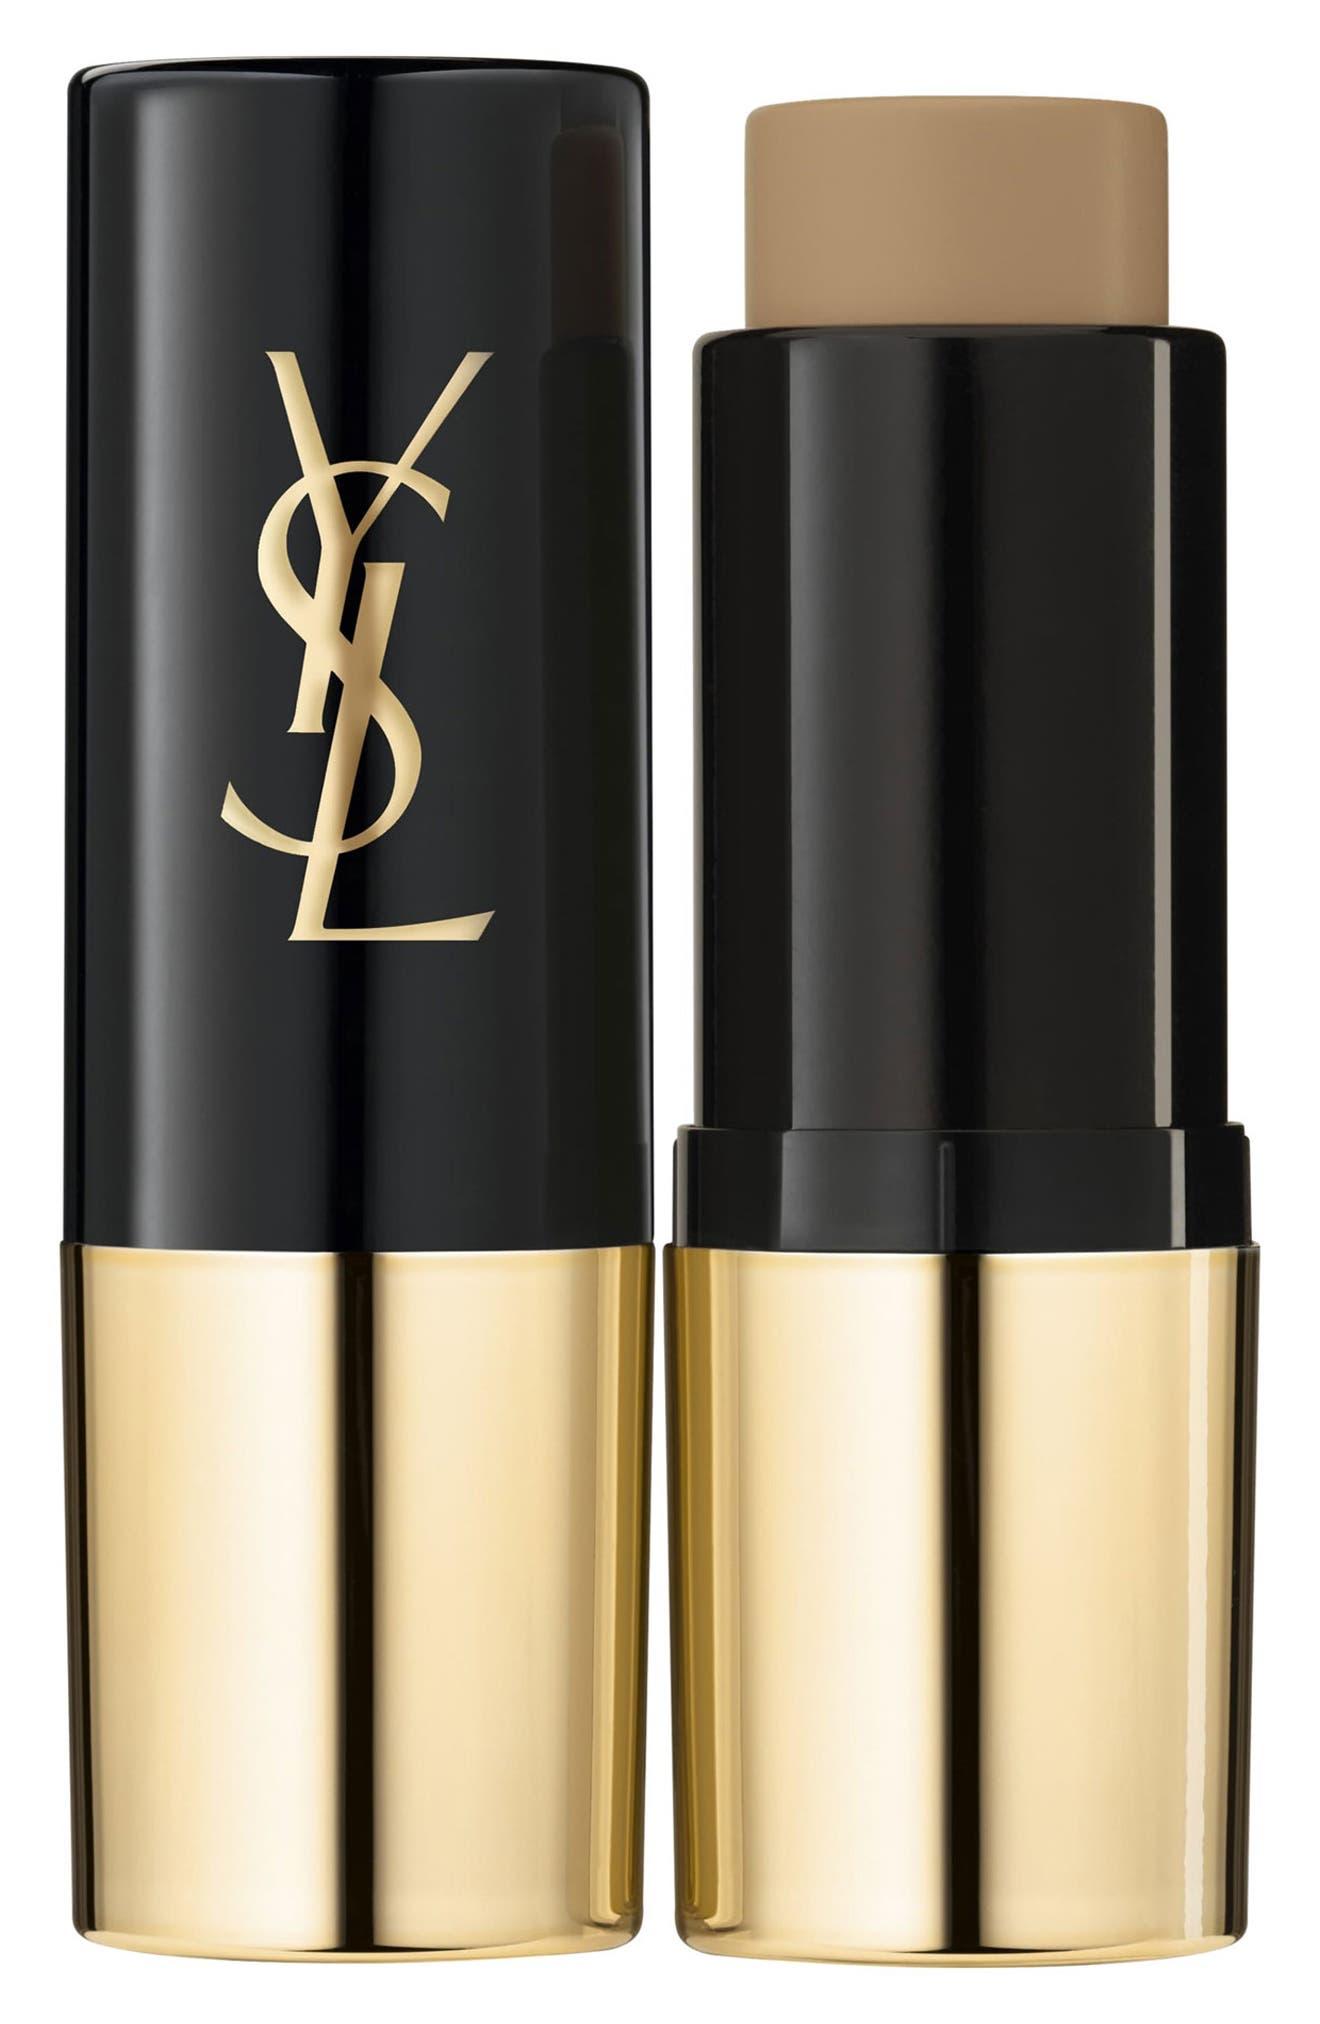 Yves Saint Laurent All Hours Foundation Stick - B60 Amber